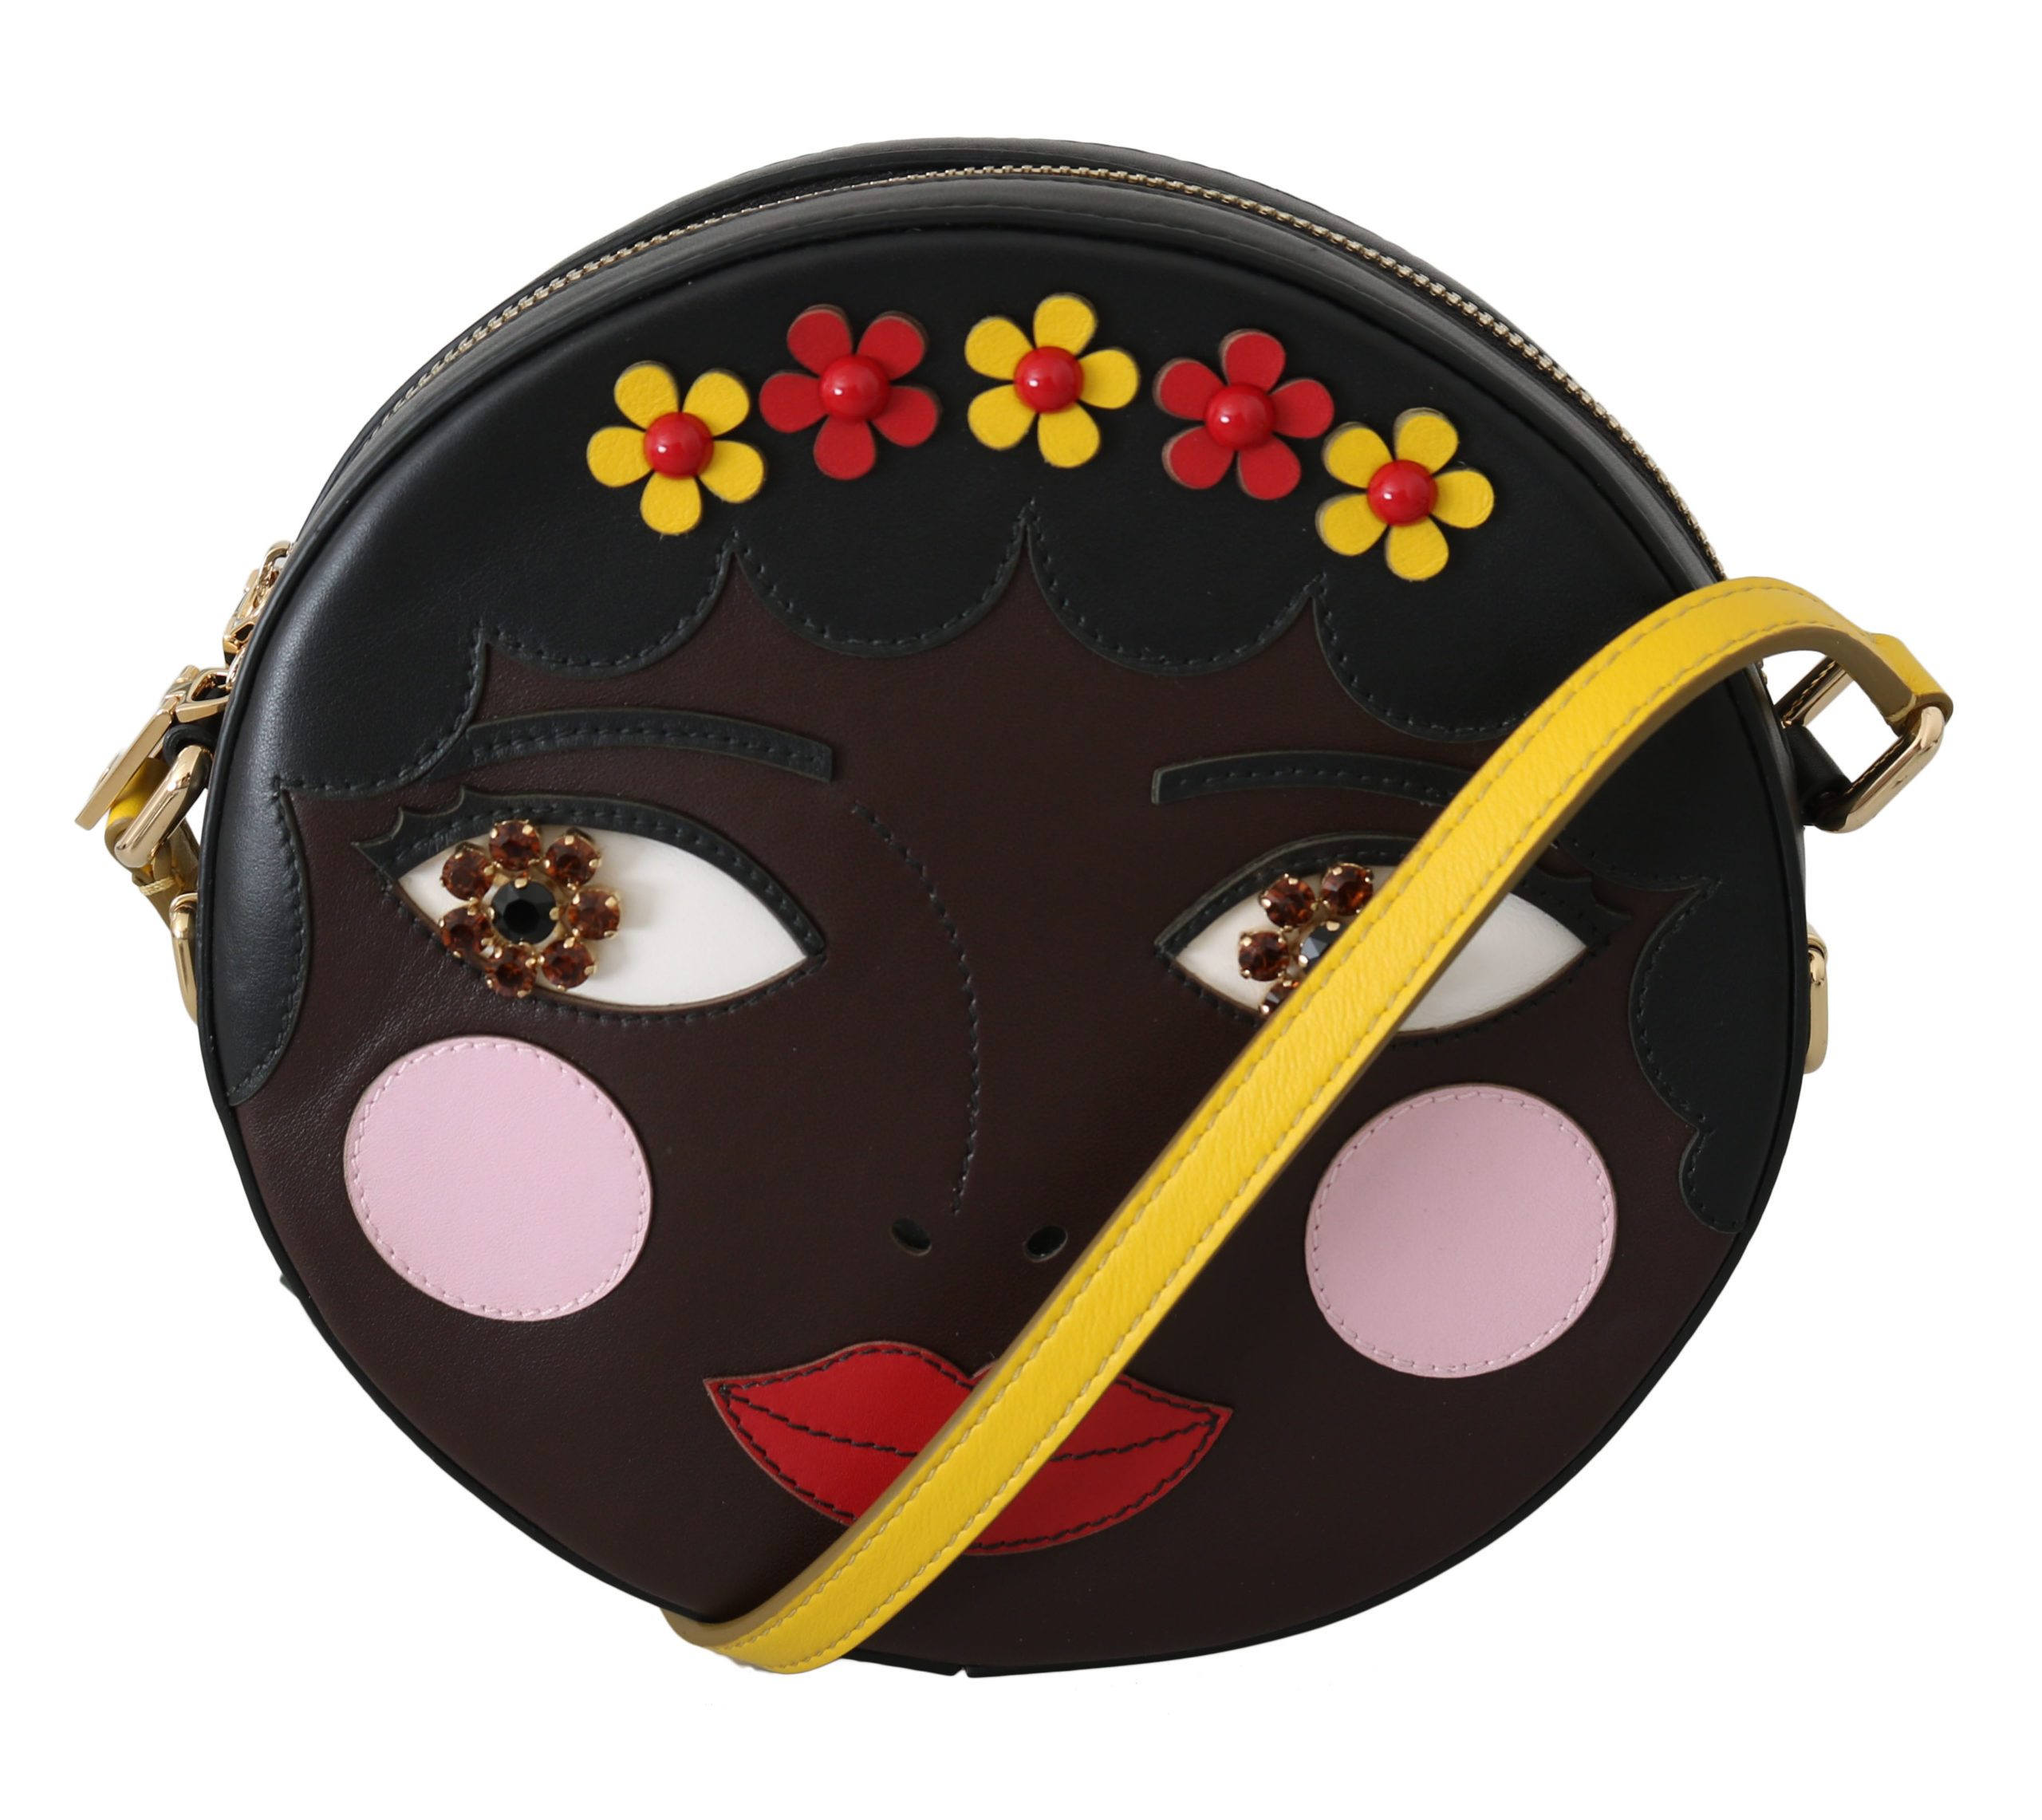 Dolce & Gabbana Women's GLAM Leather Bambola Italian Crossbody Bag Brown VAS8703